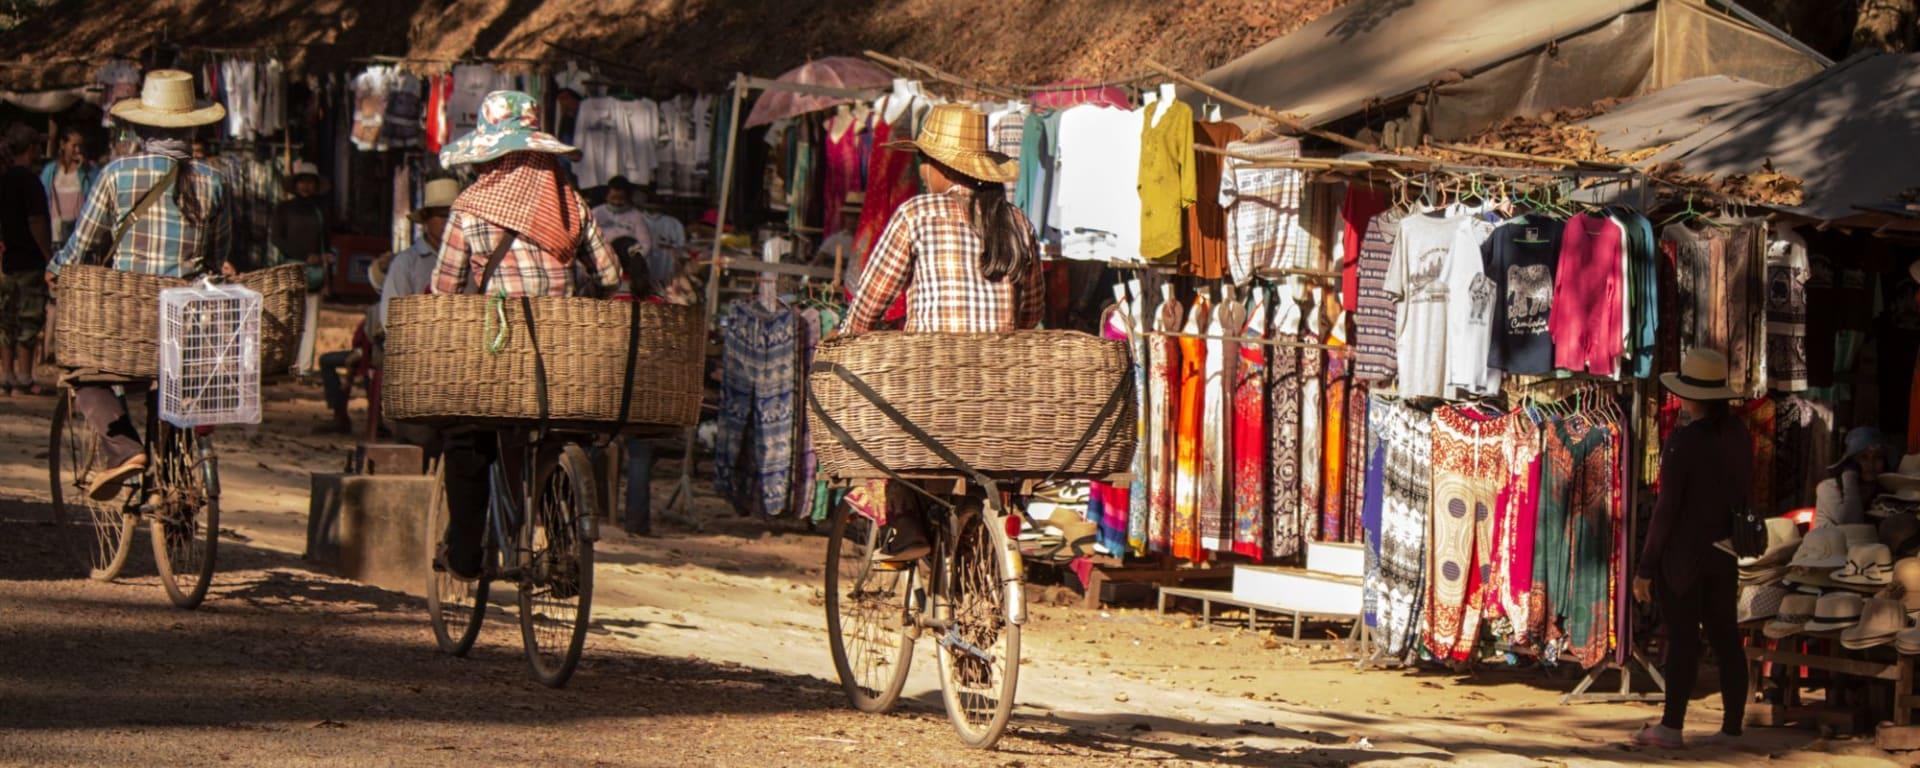 Traversée de Phnom Penh à Angkor: Three ladies riding bicycle